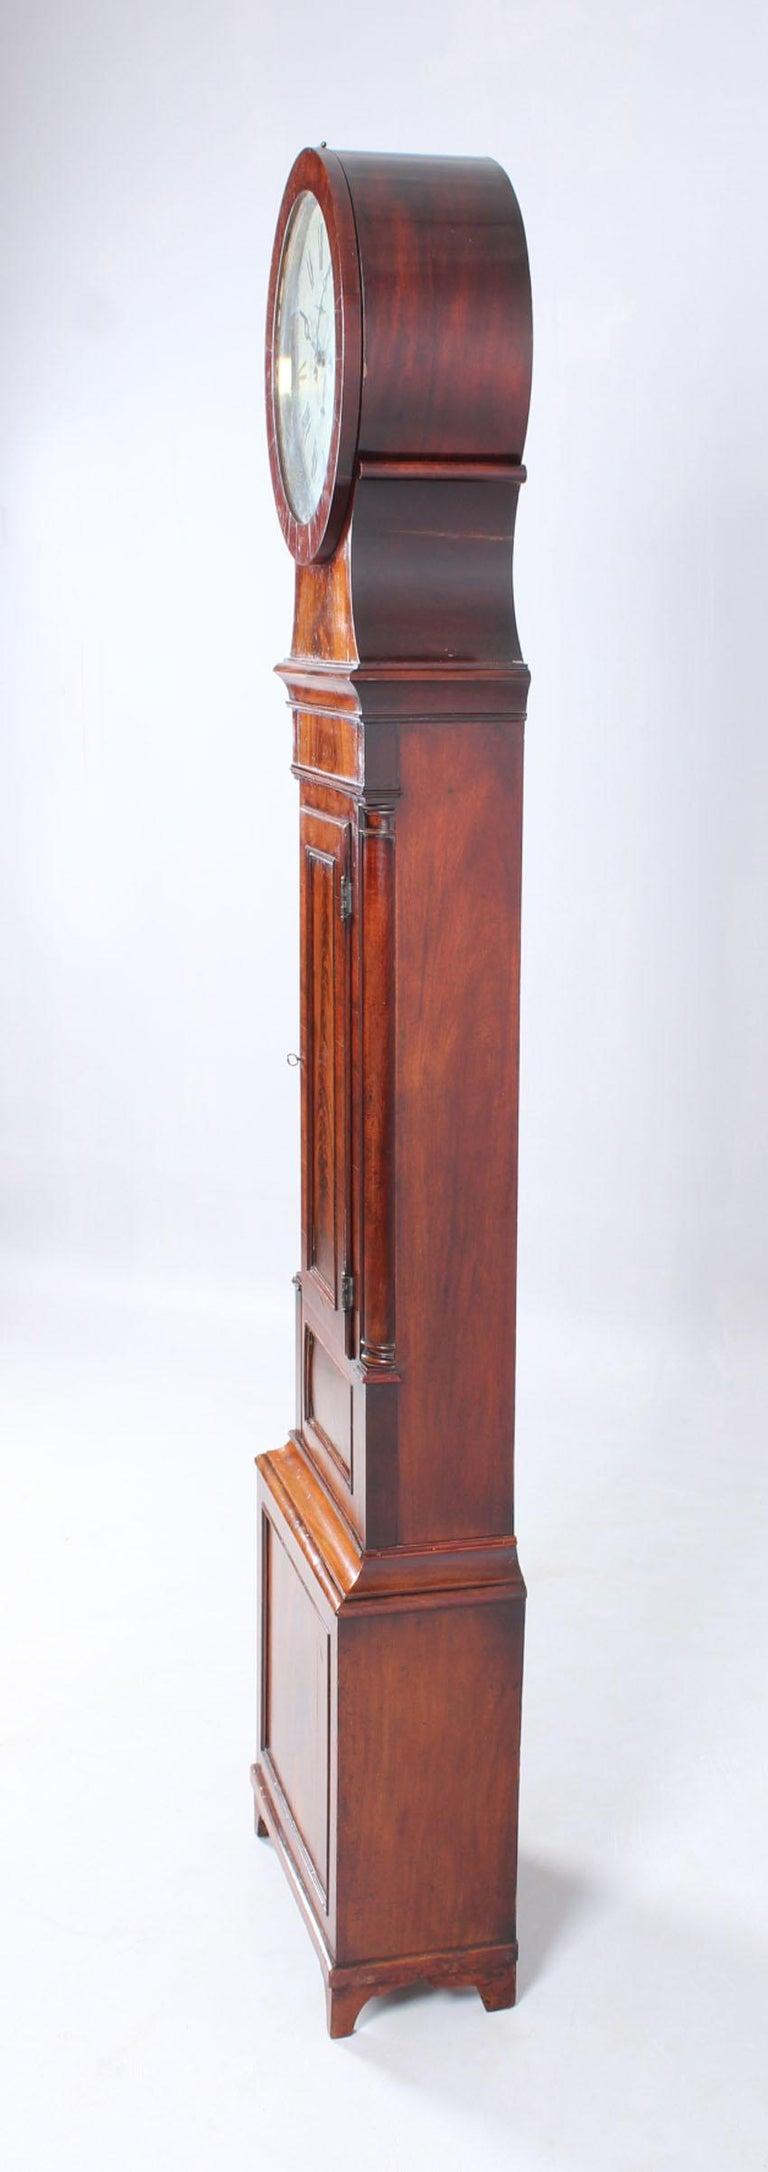 19th Century British Grandfather Clock, Longcase, Mahogany, Scotland circa 1825 For Sale 7